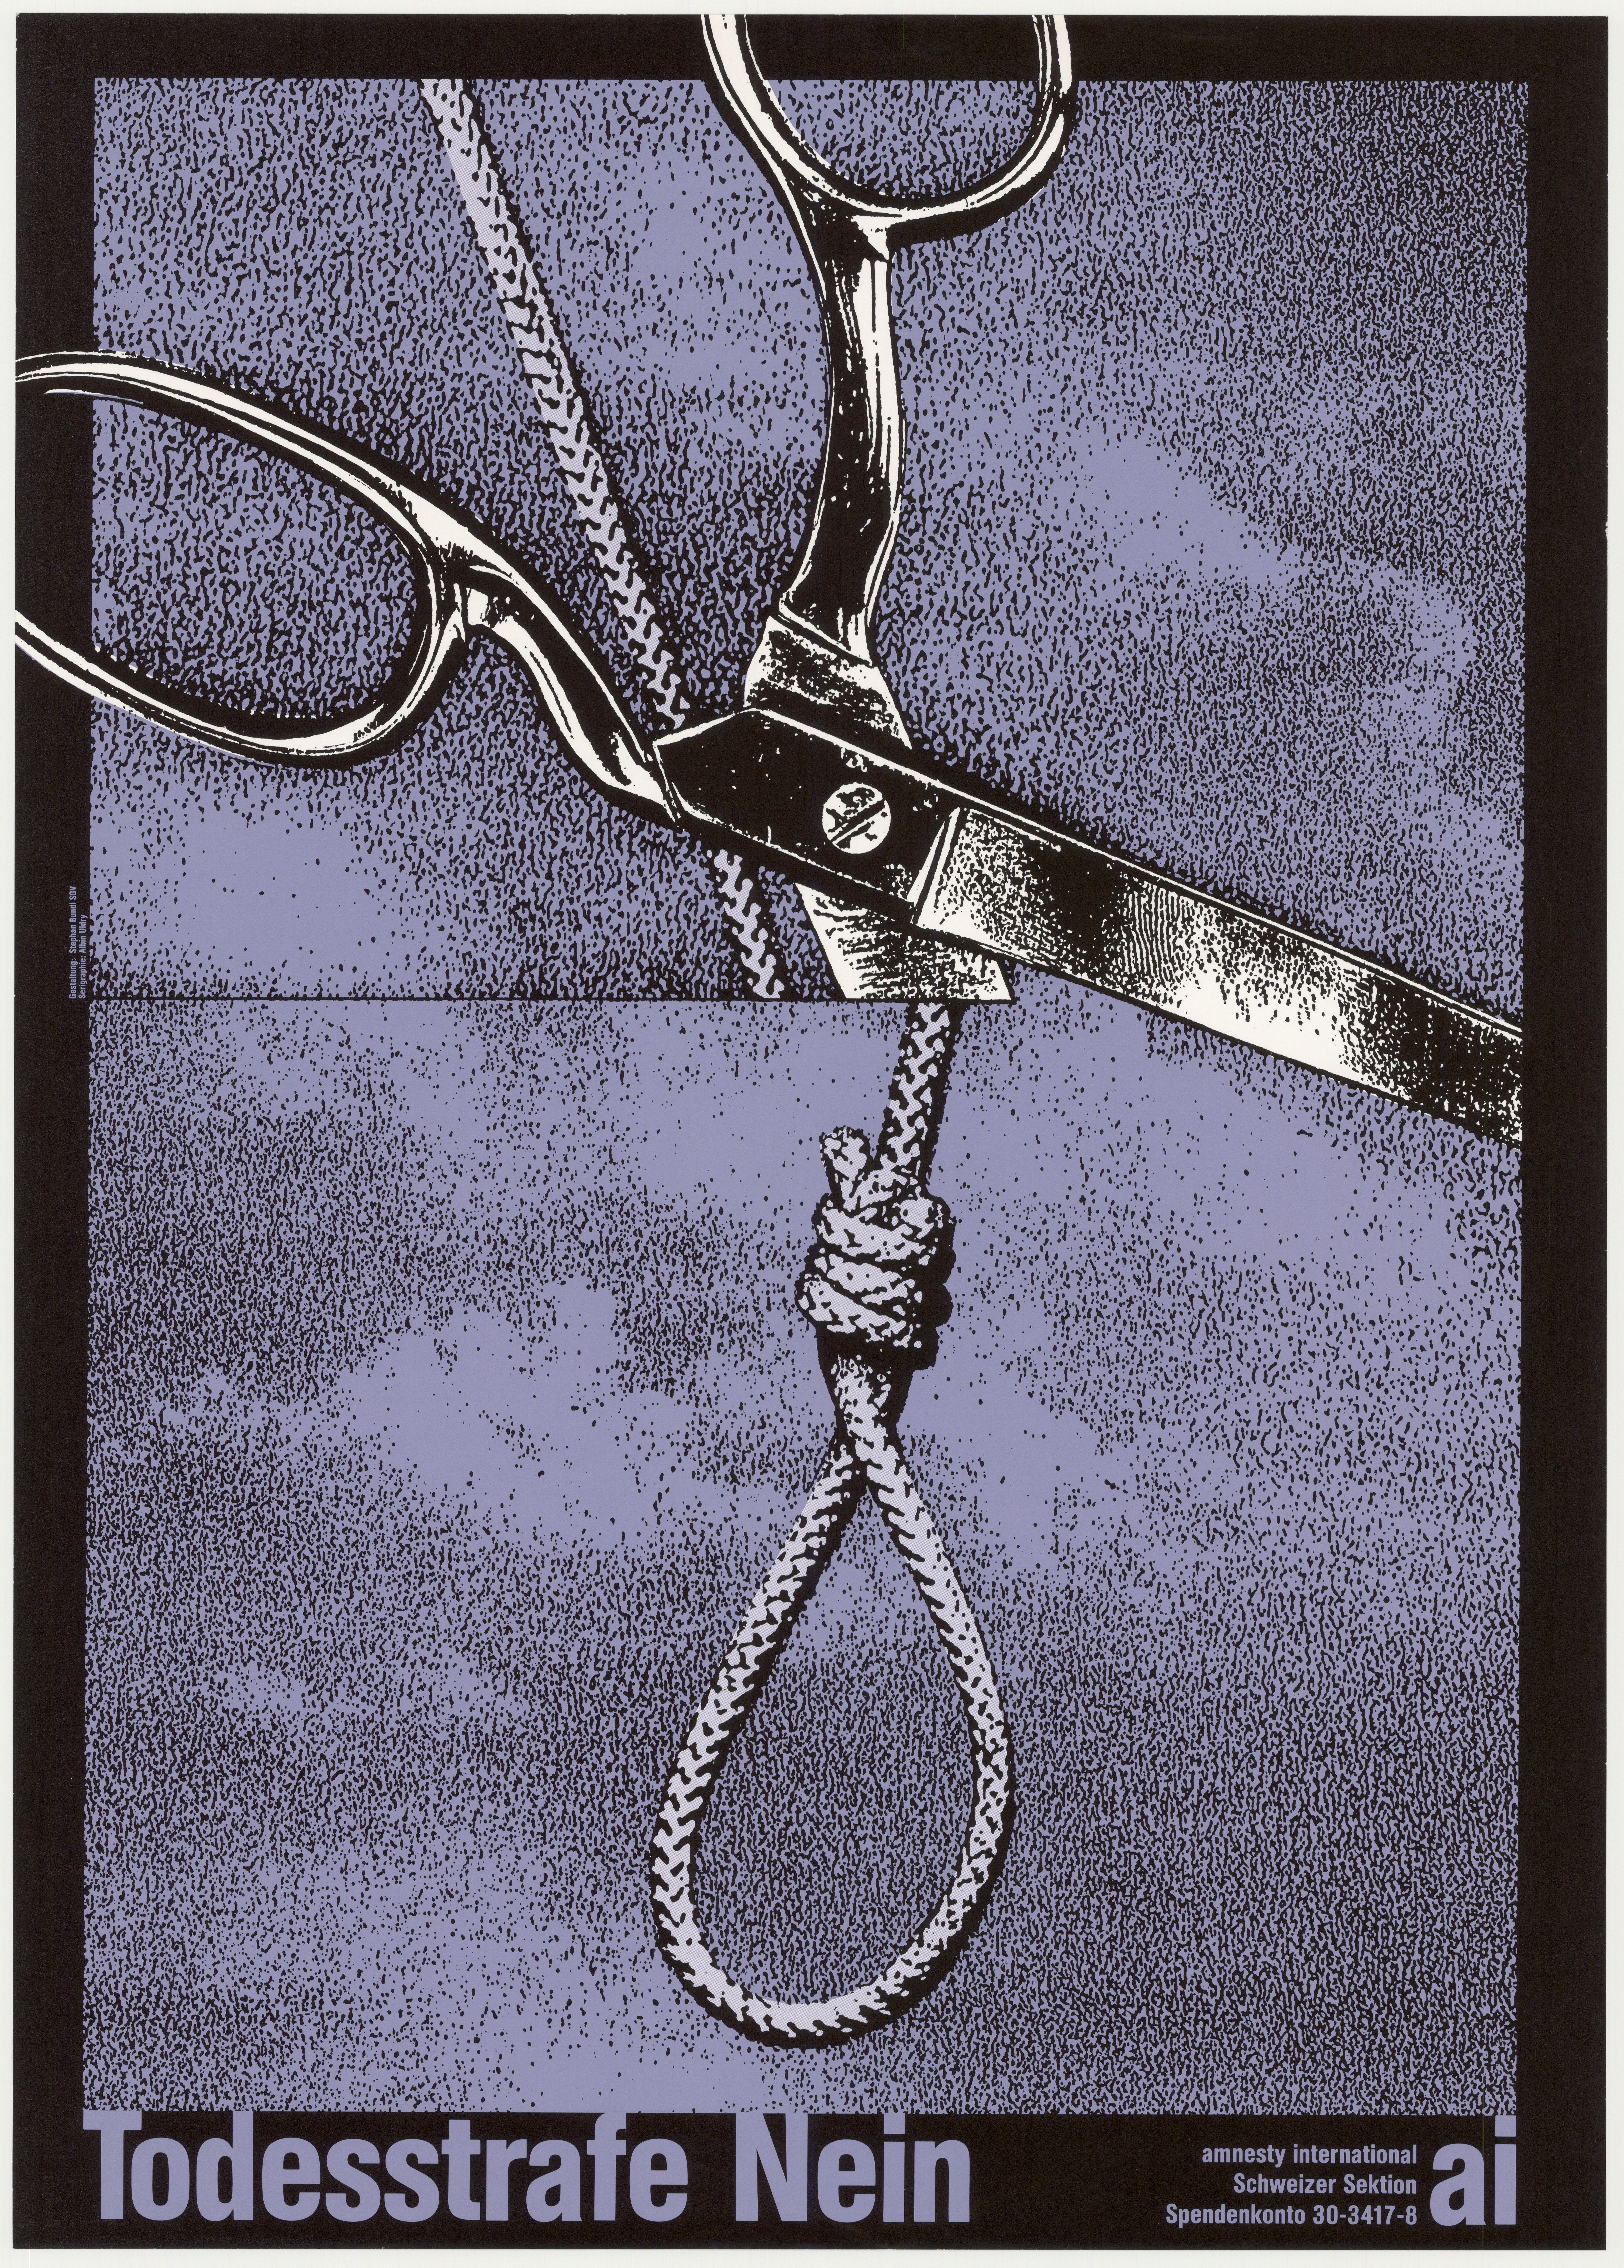 Vintage Poster: Todesstrafe Nein